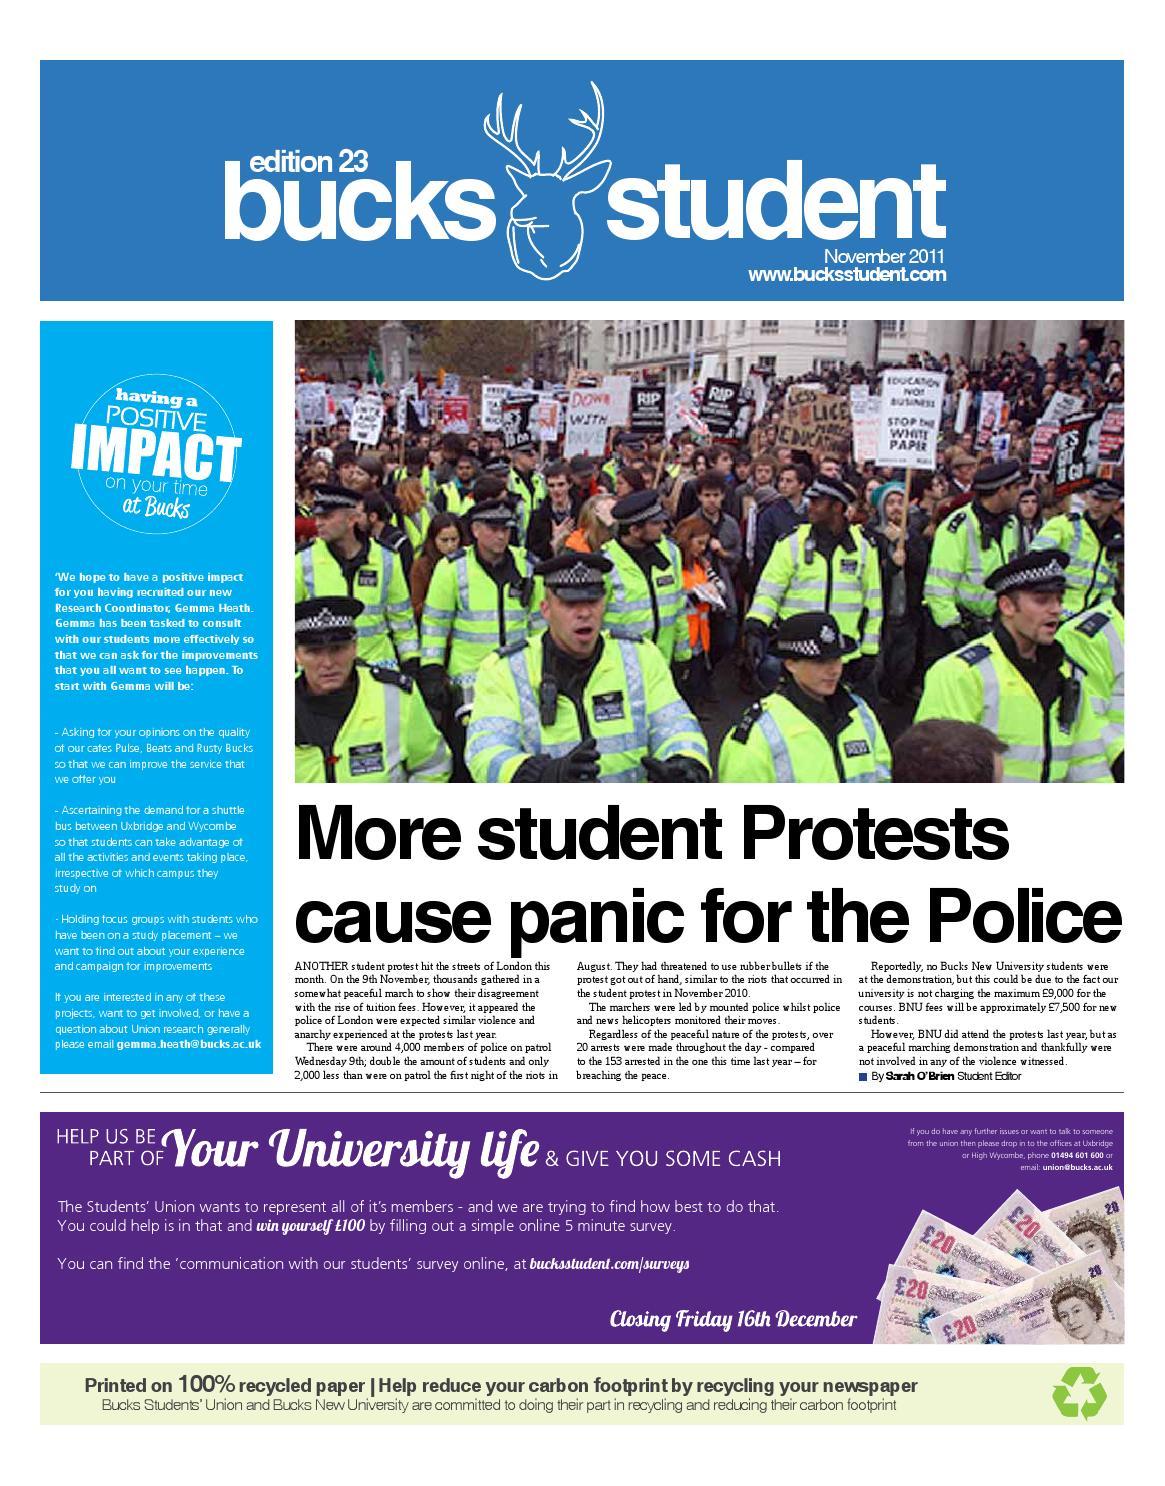 The Bucks Student - Edition 23 by The Bucks Student - issuu 122b94b0e